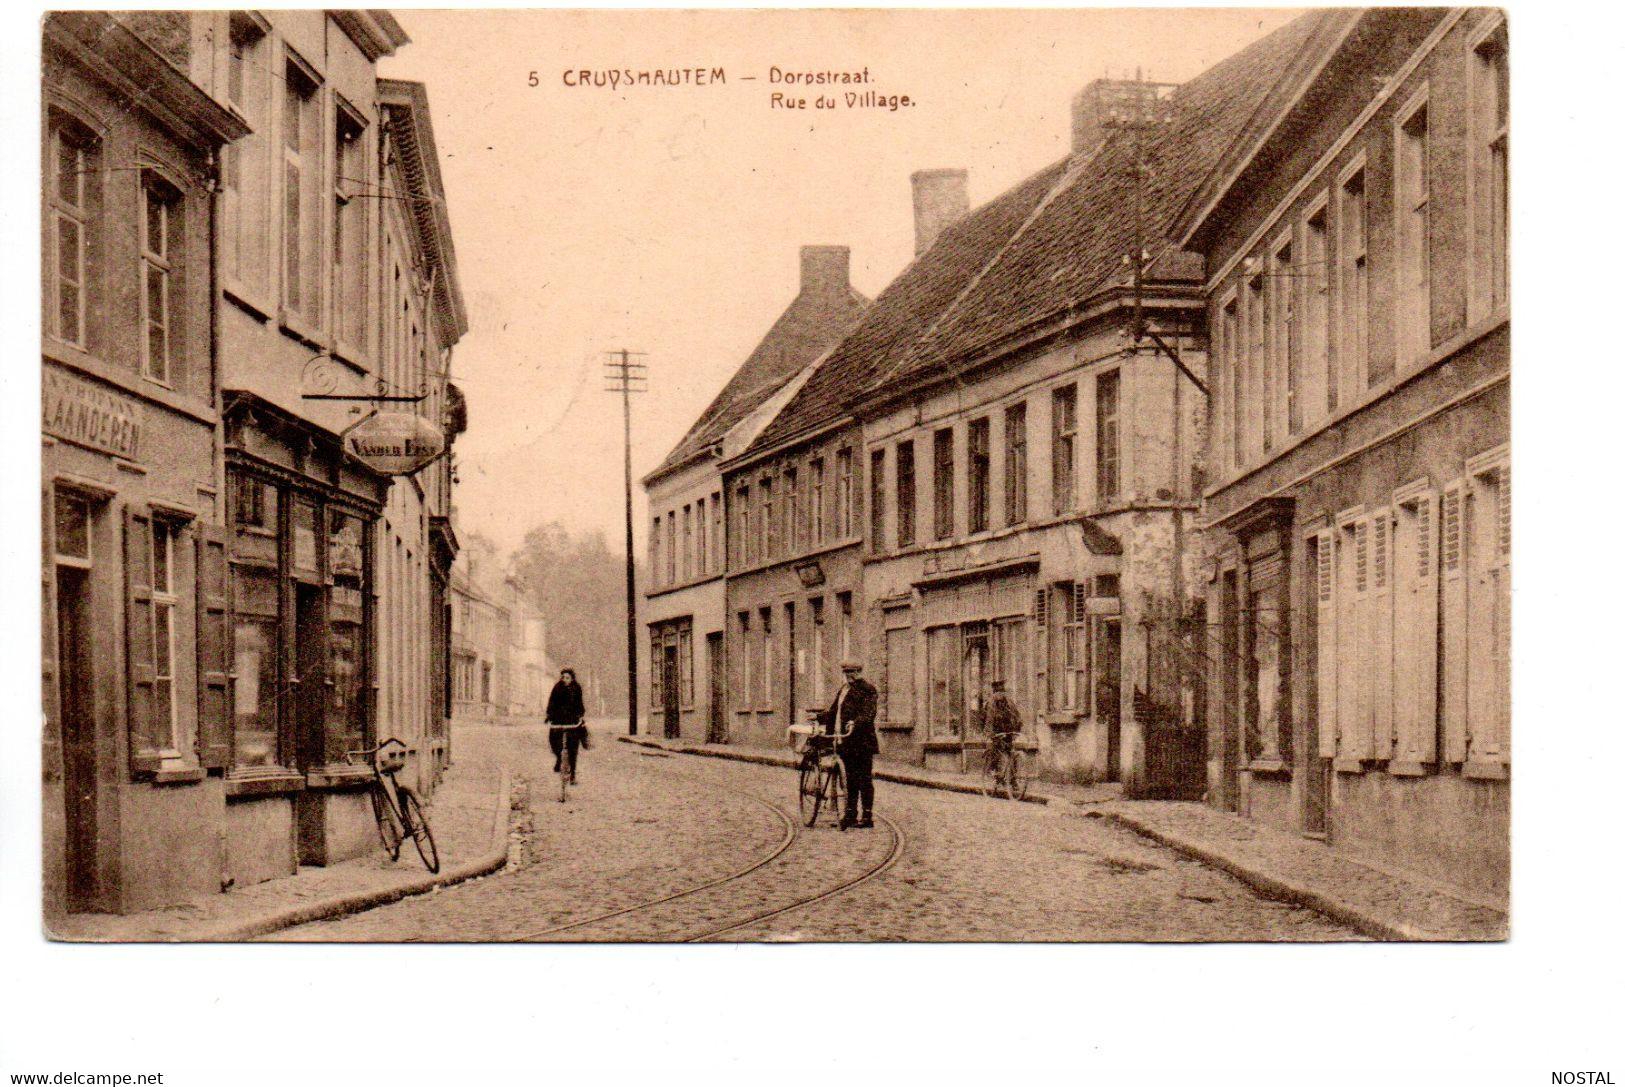 A45 Cruyshautem: Dorpstraat - Kruishoutem